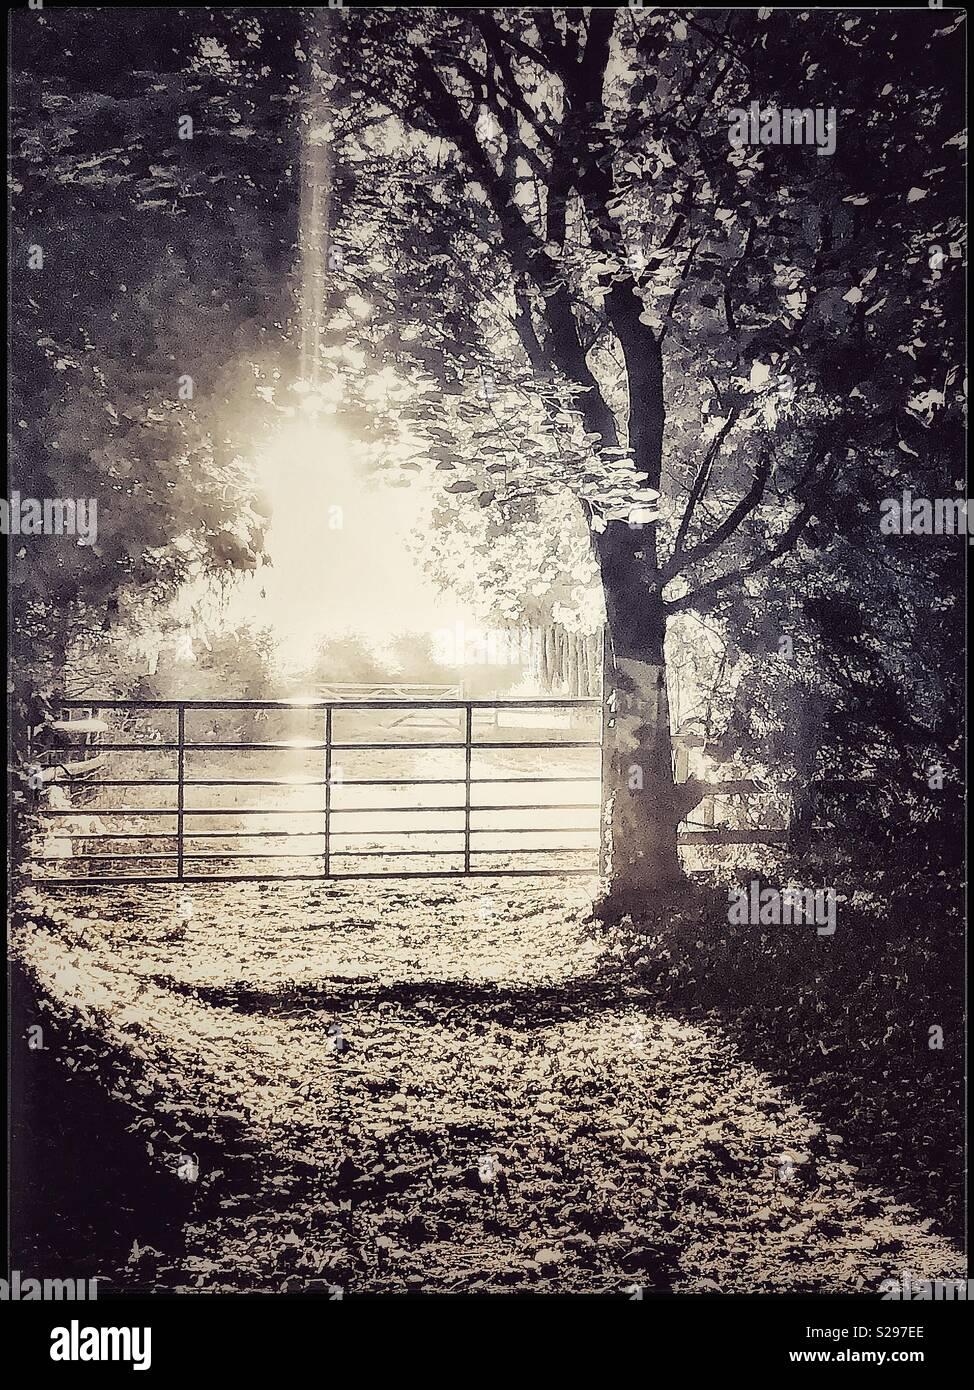 Morning sunshine in black and white - Stock Image